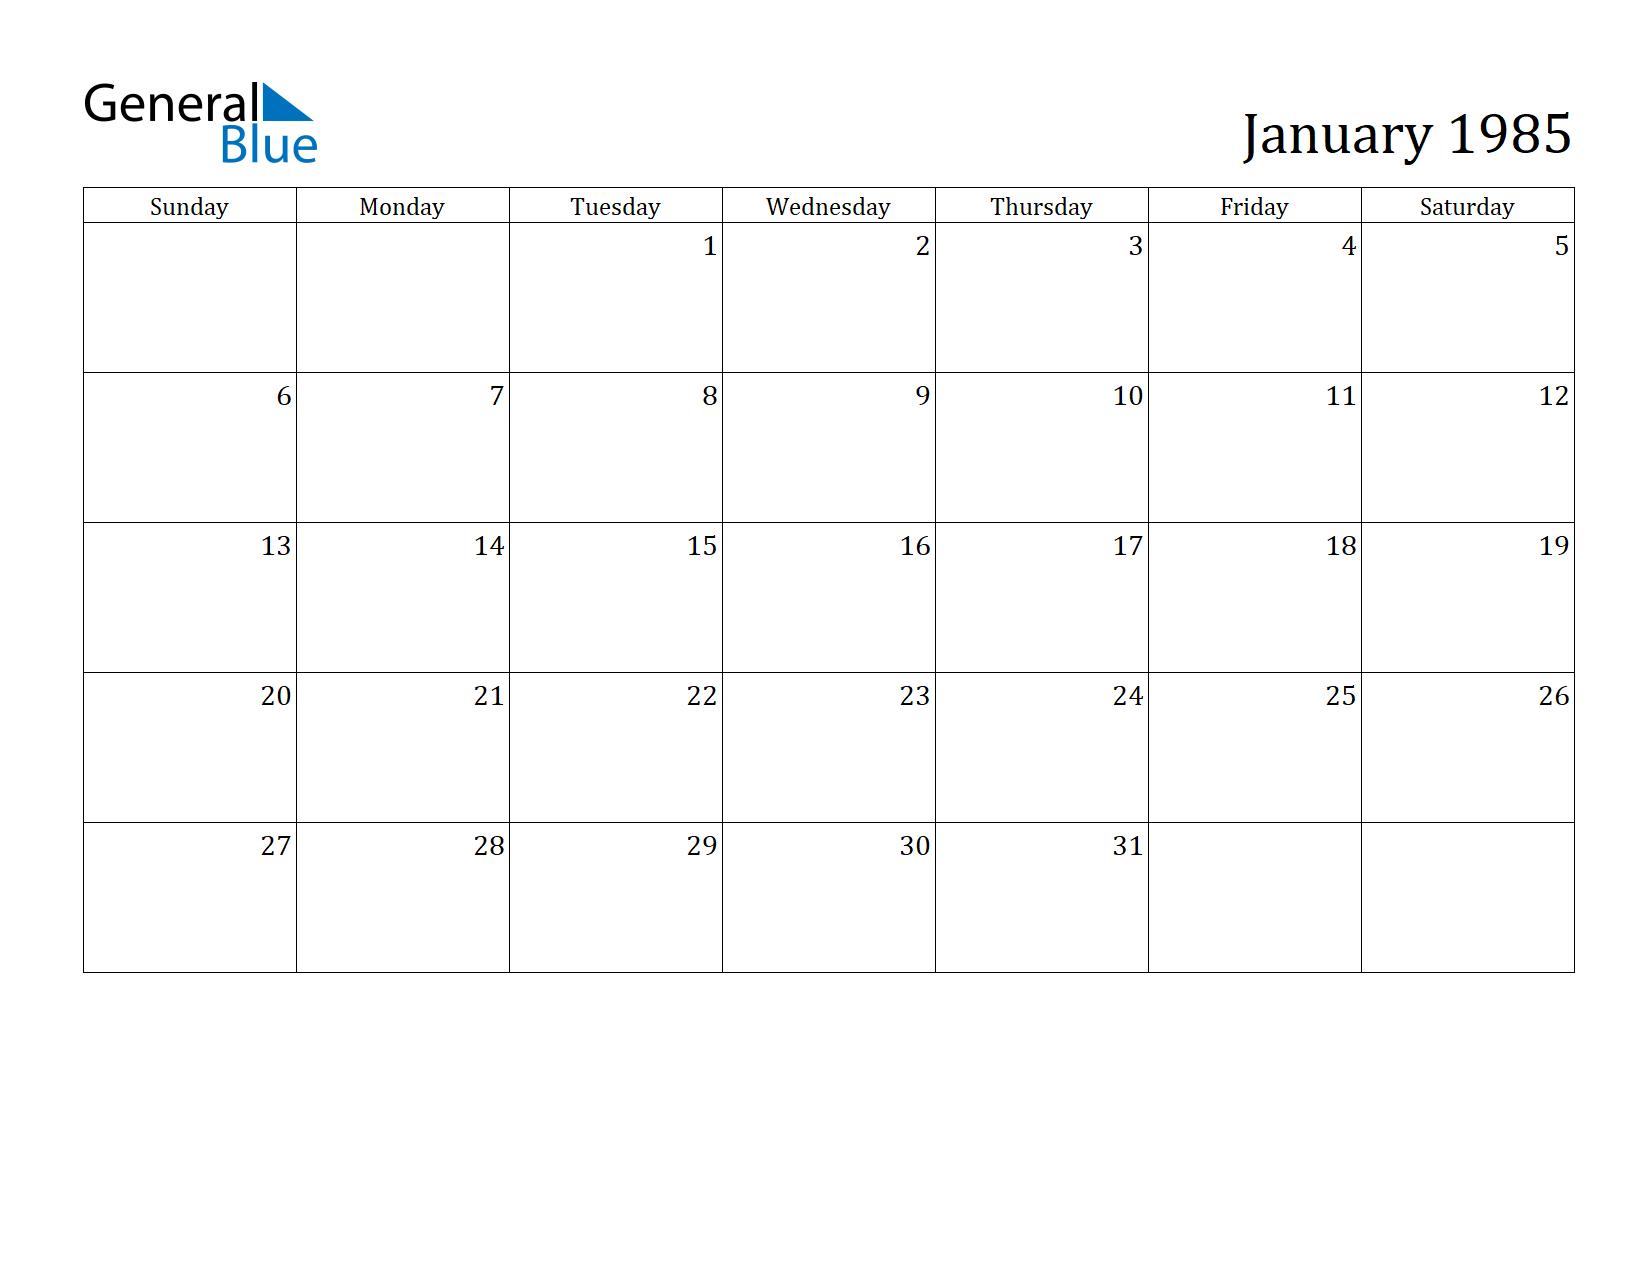 1985 Calendar.January 1985 Calendar General Blue